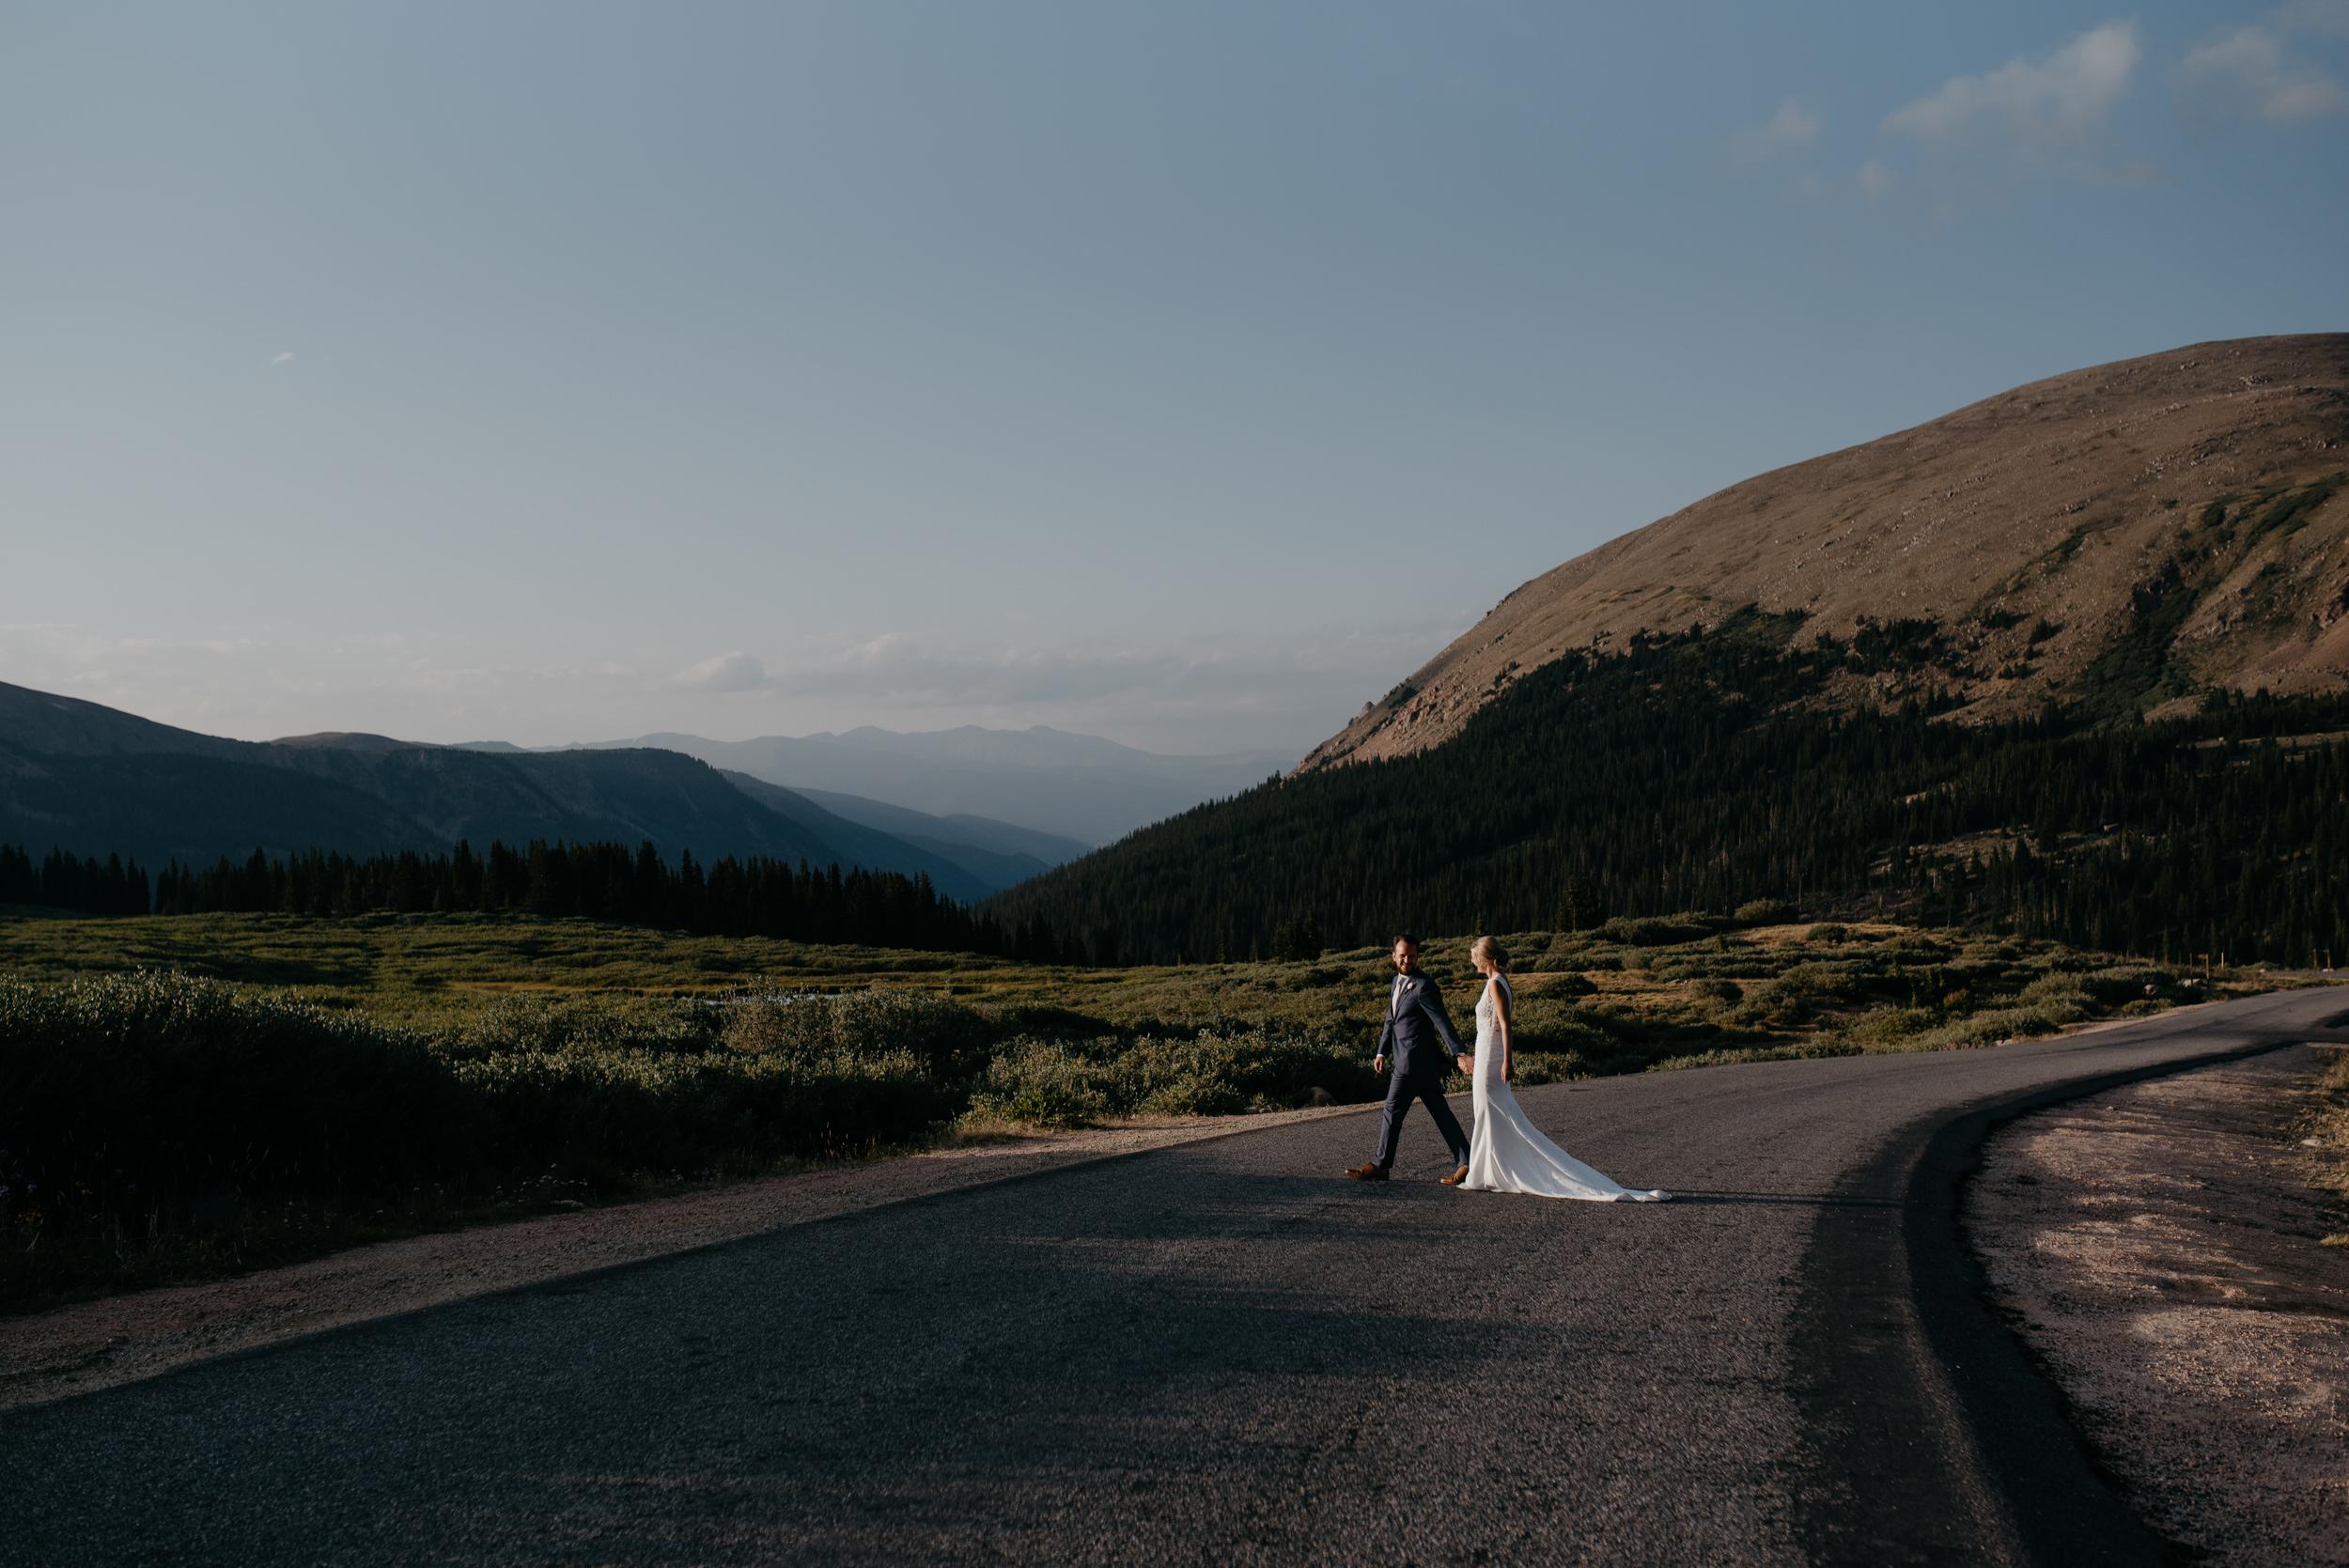 Bride and groom walking in the road